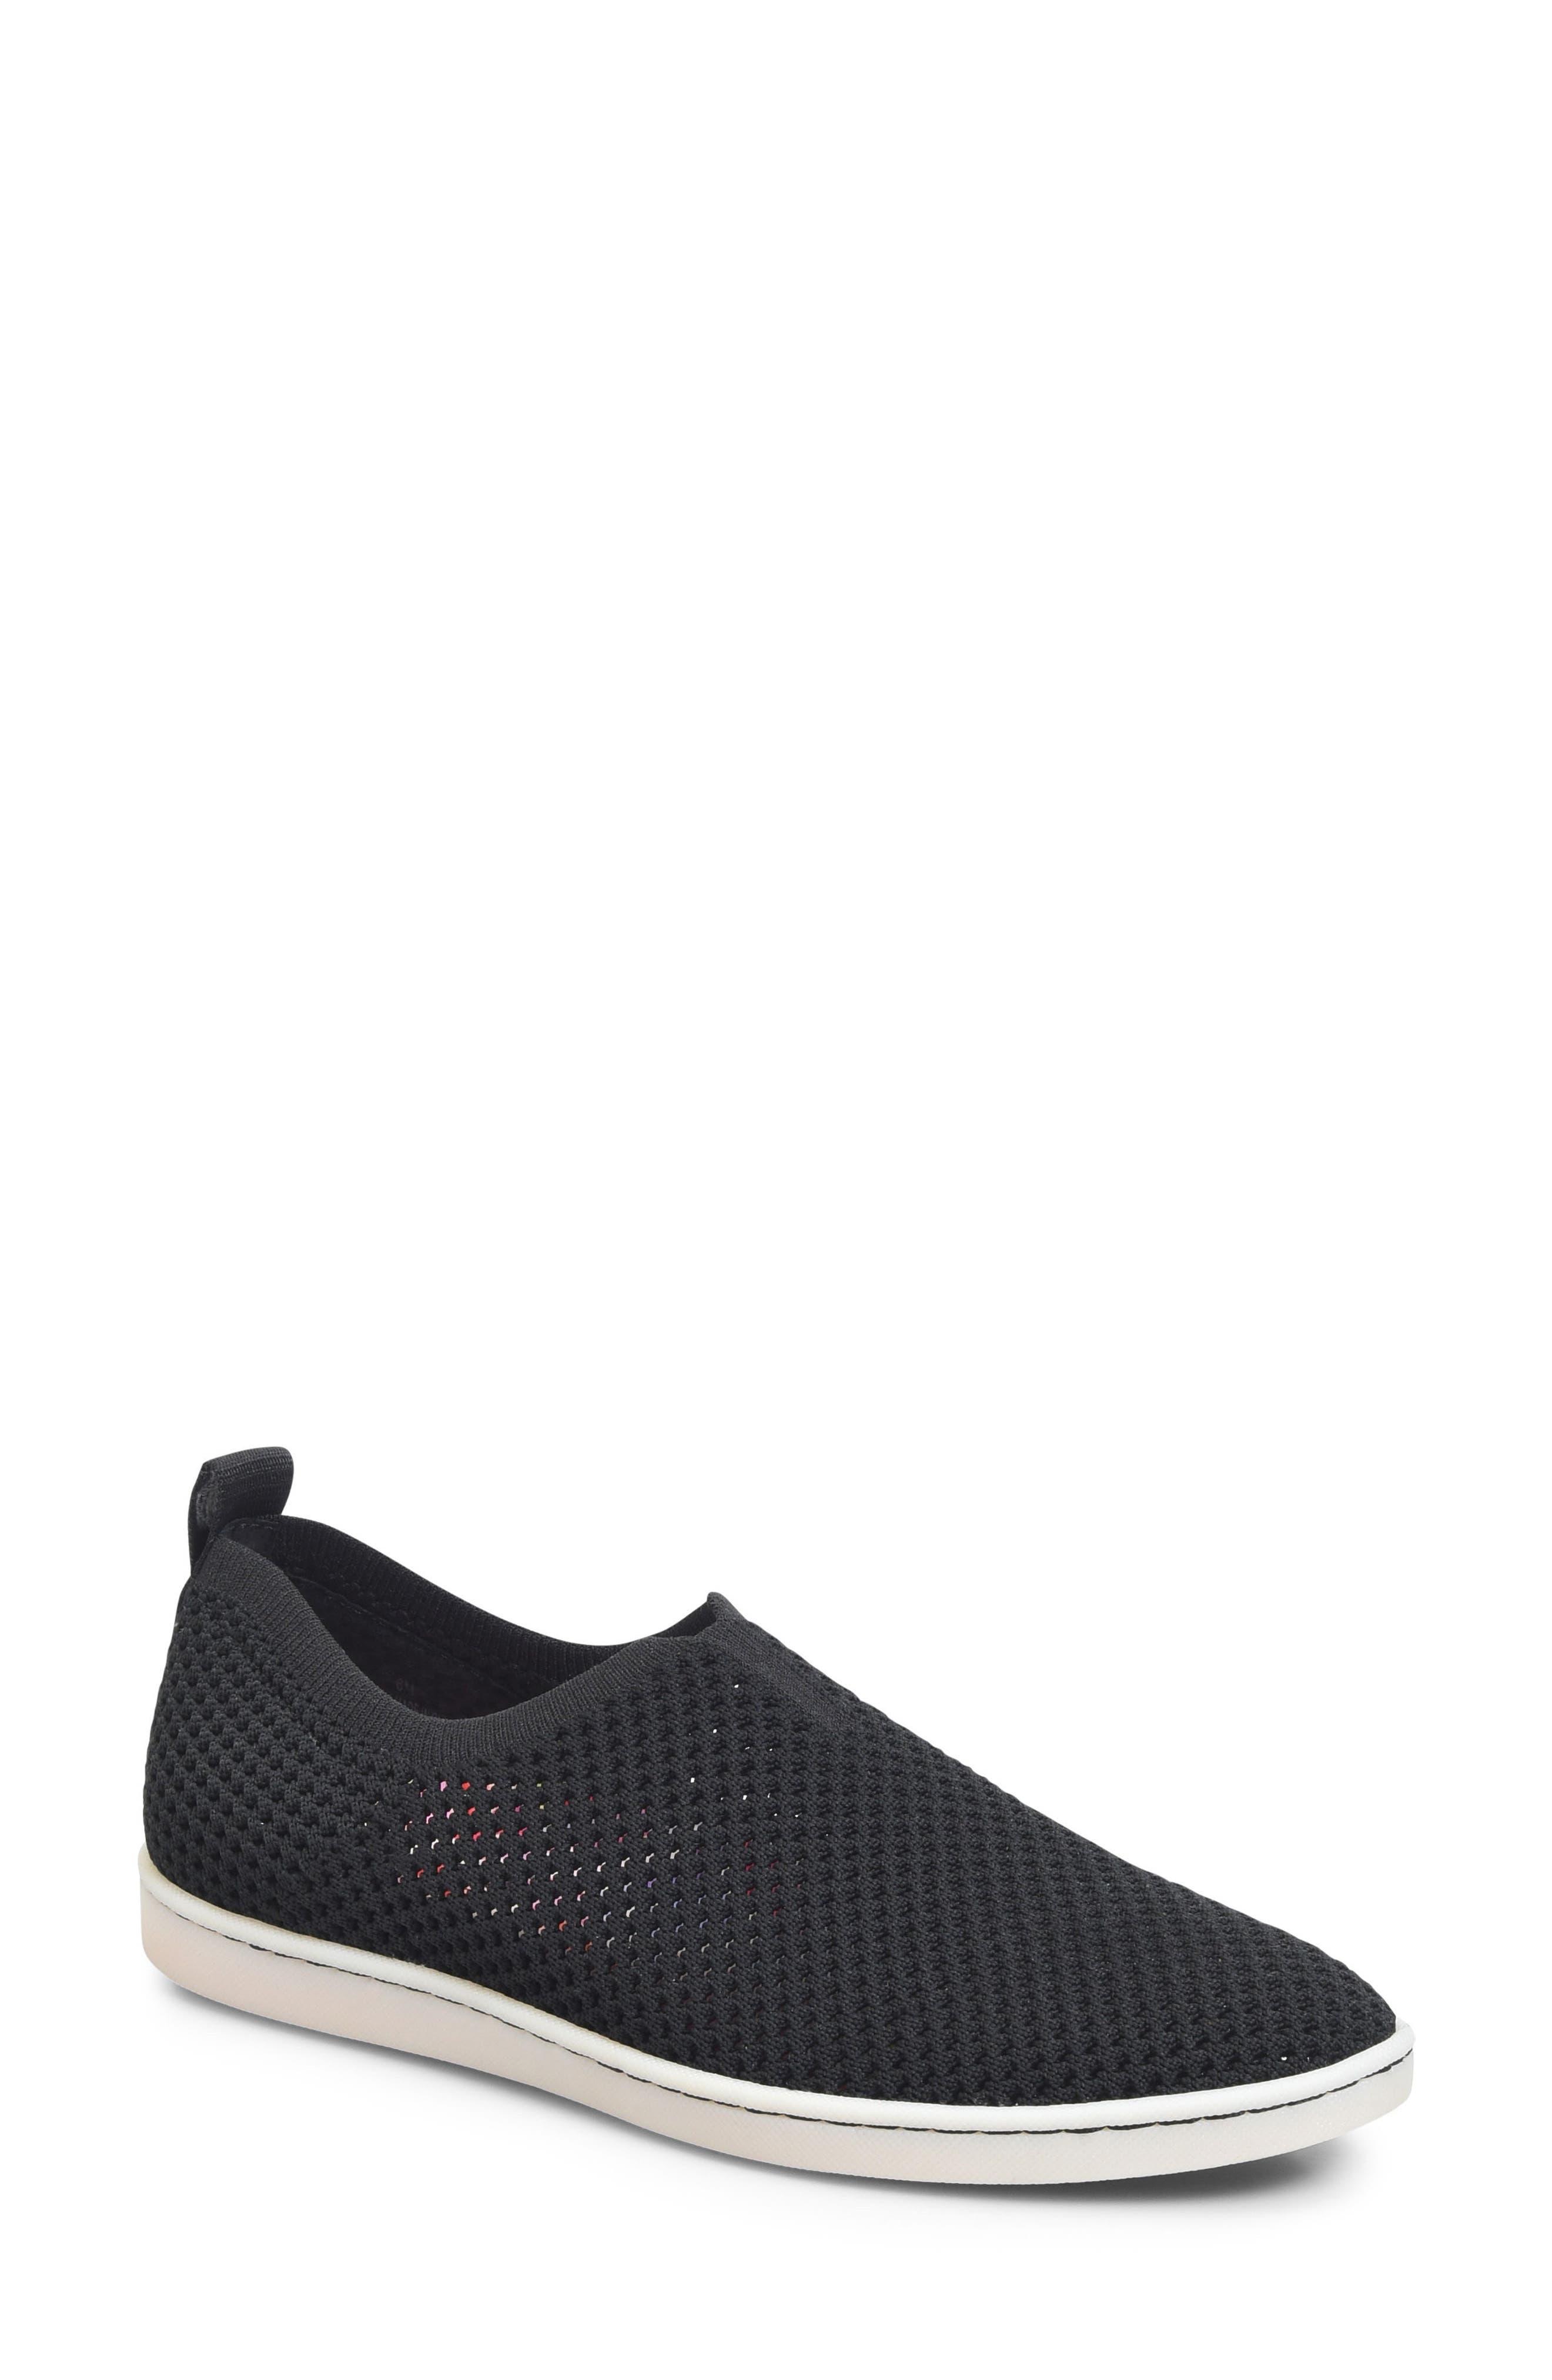 Hazy Slip-On Sneaker,                         Main,                         color, Black Fabric